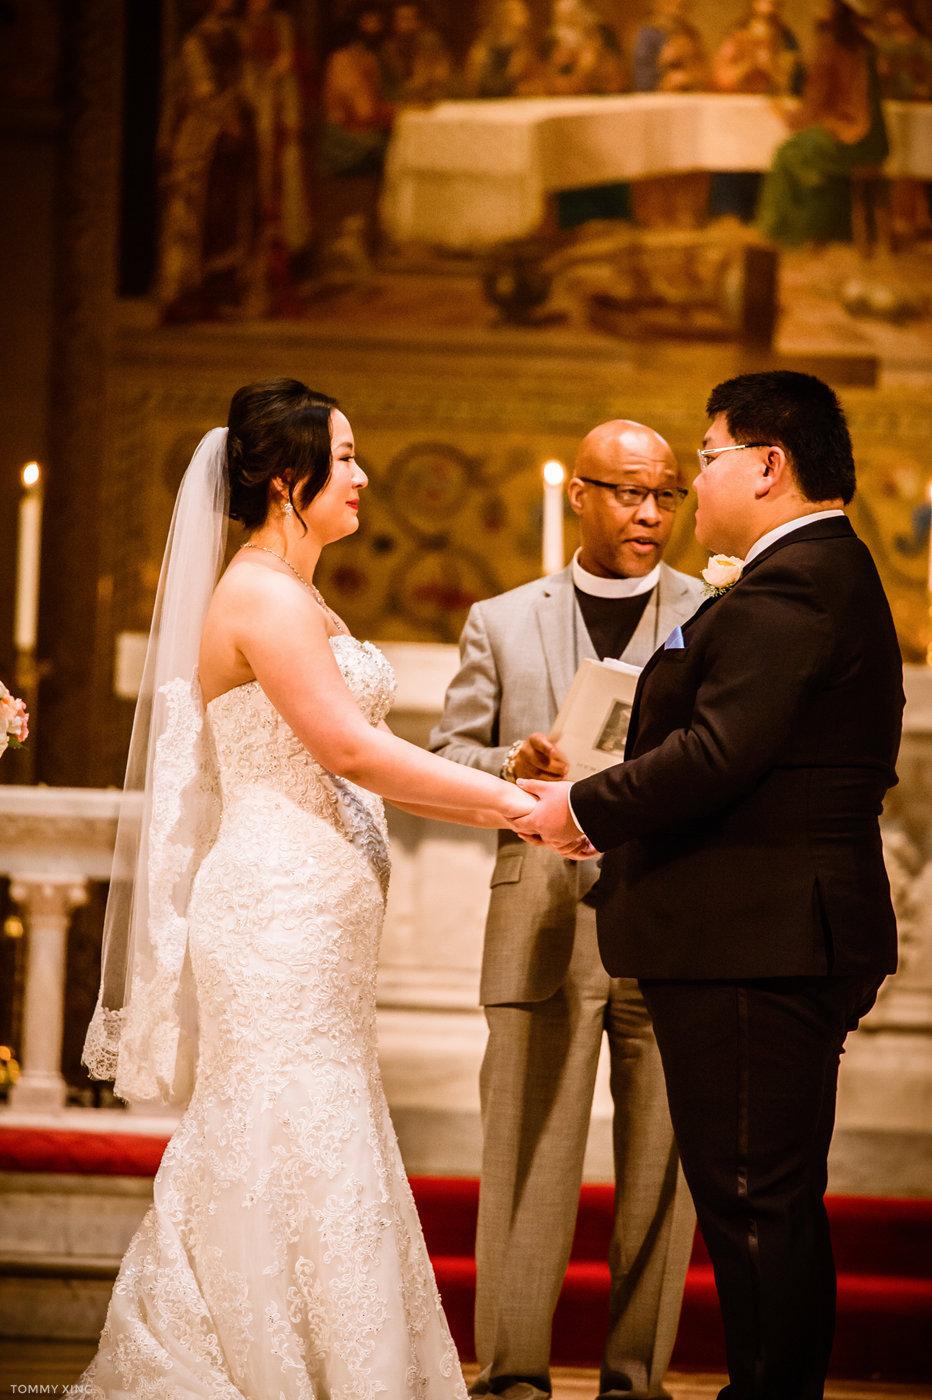 STANFORD MEMORIAL CHURCH WEDDING - Wenjie & Chengcheng - SAN FRANCISCO BAY AREA 斯坦福教堂婚礼跟拍 - 洛杉矶婚礼婚纱照摄影师 Tommy Xing Photography099.jpg